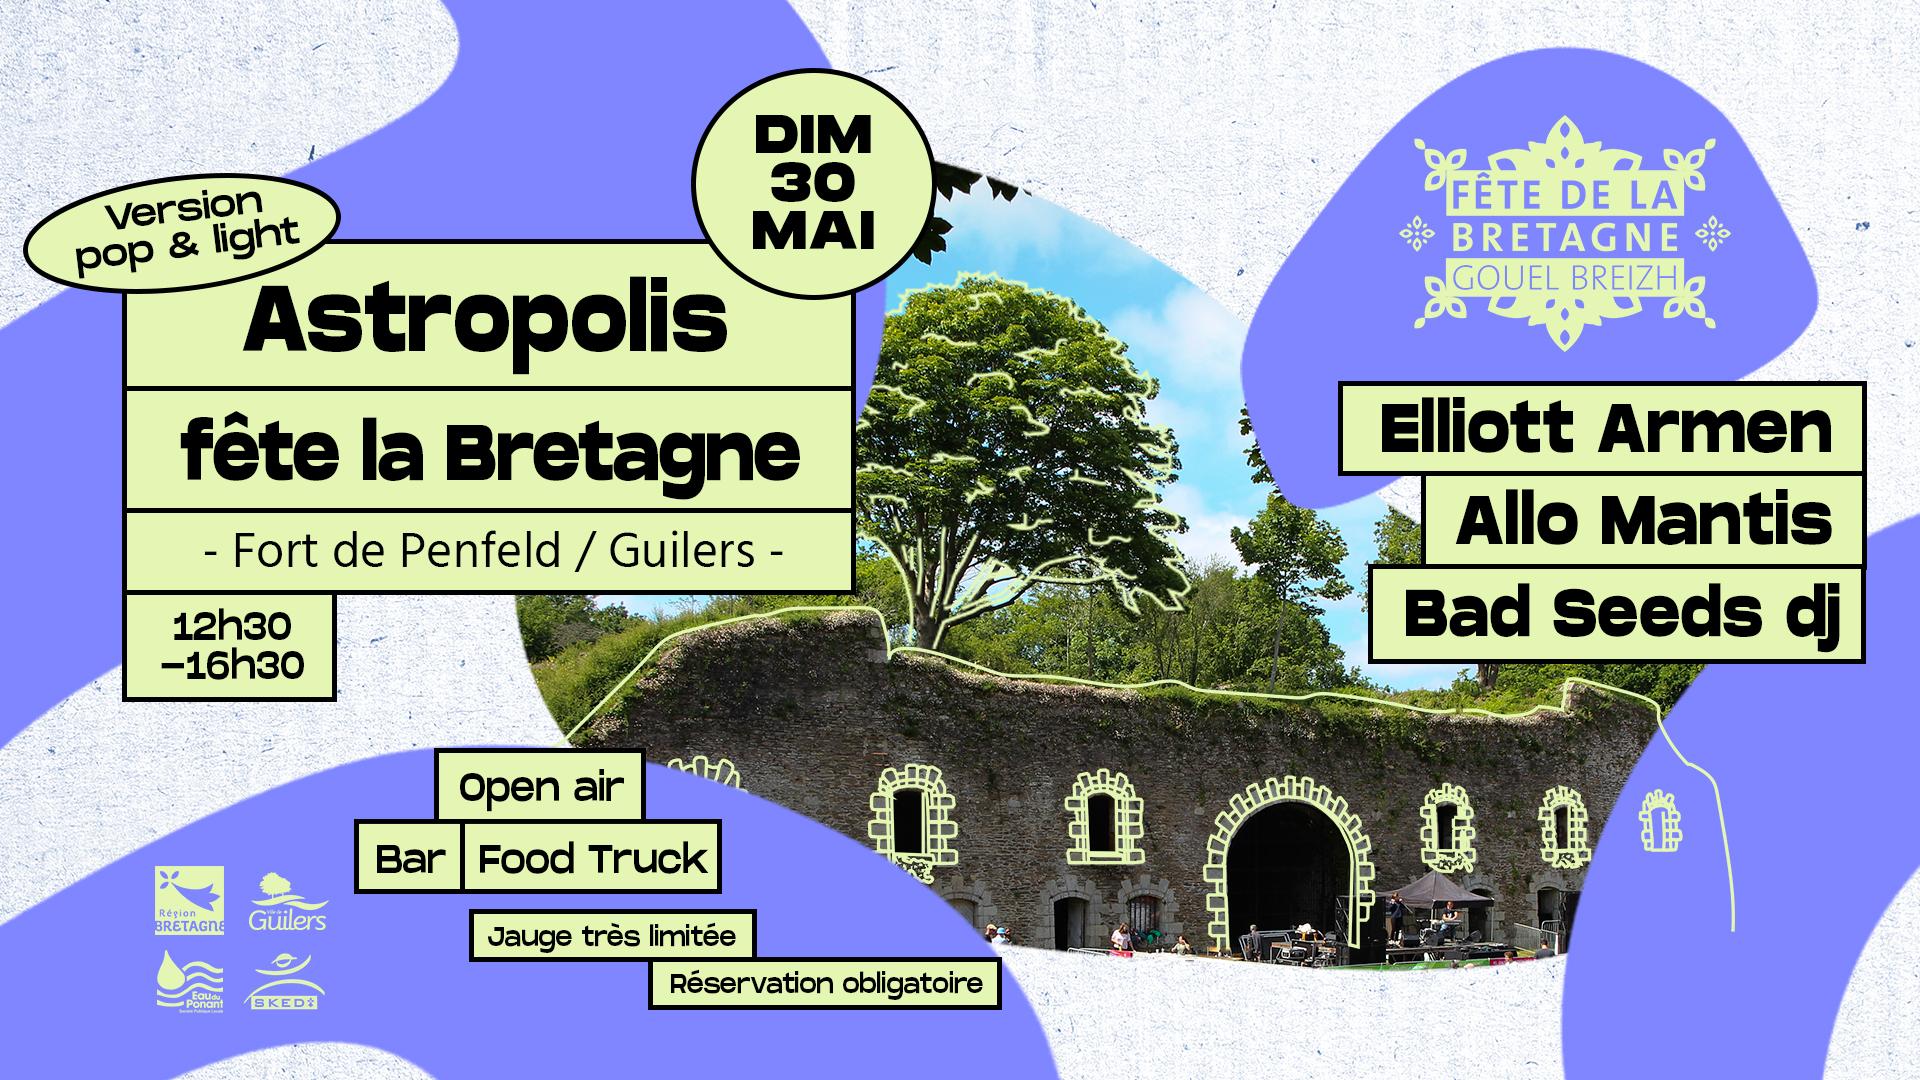 Astropolis fête la Bretagne (version light & pop)